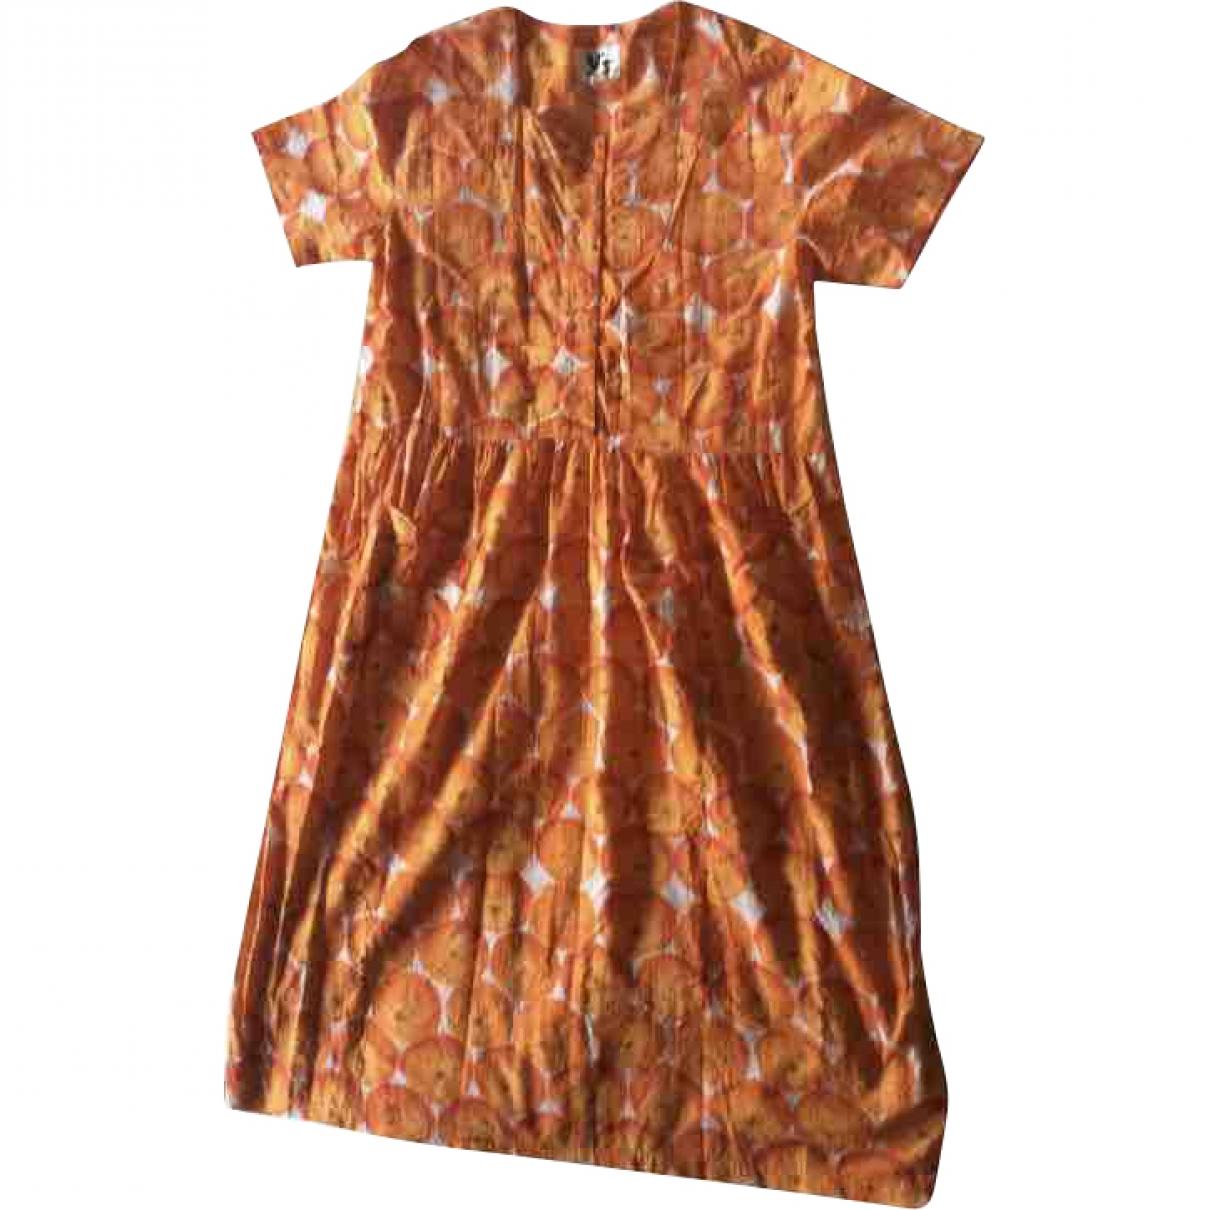 Yohji Yamamoto \N Orange Cotton dress for Women L International